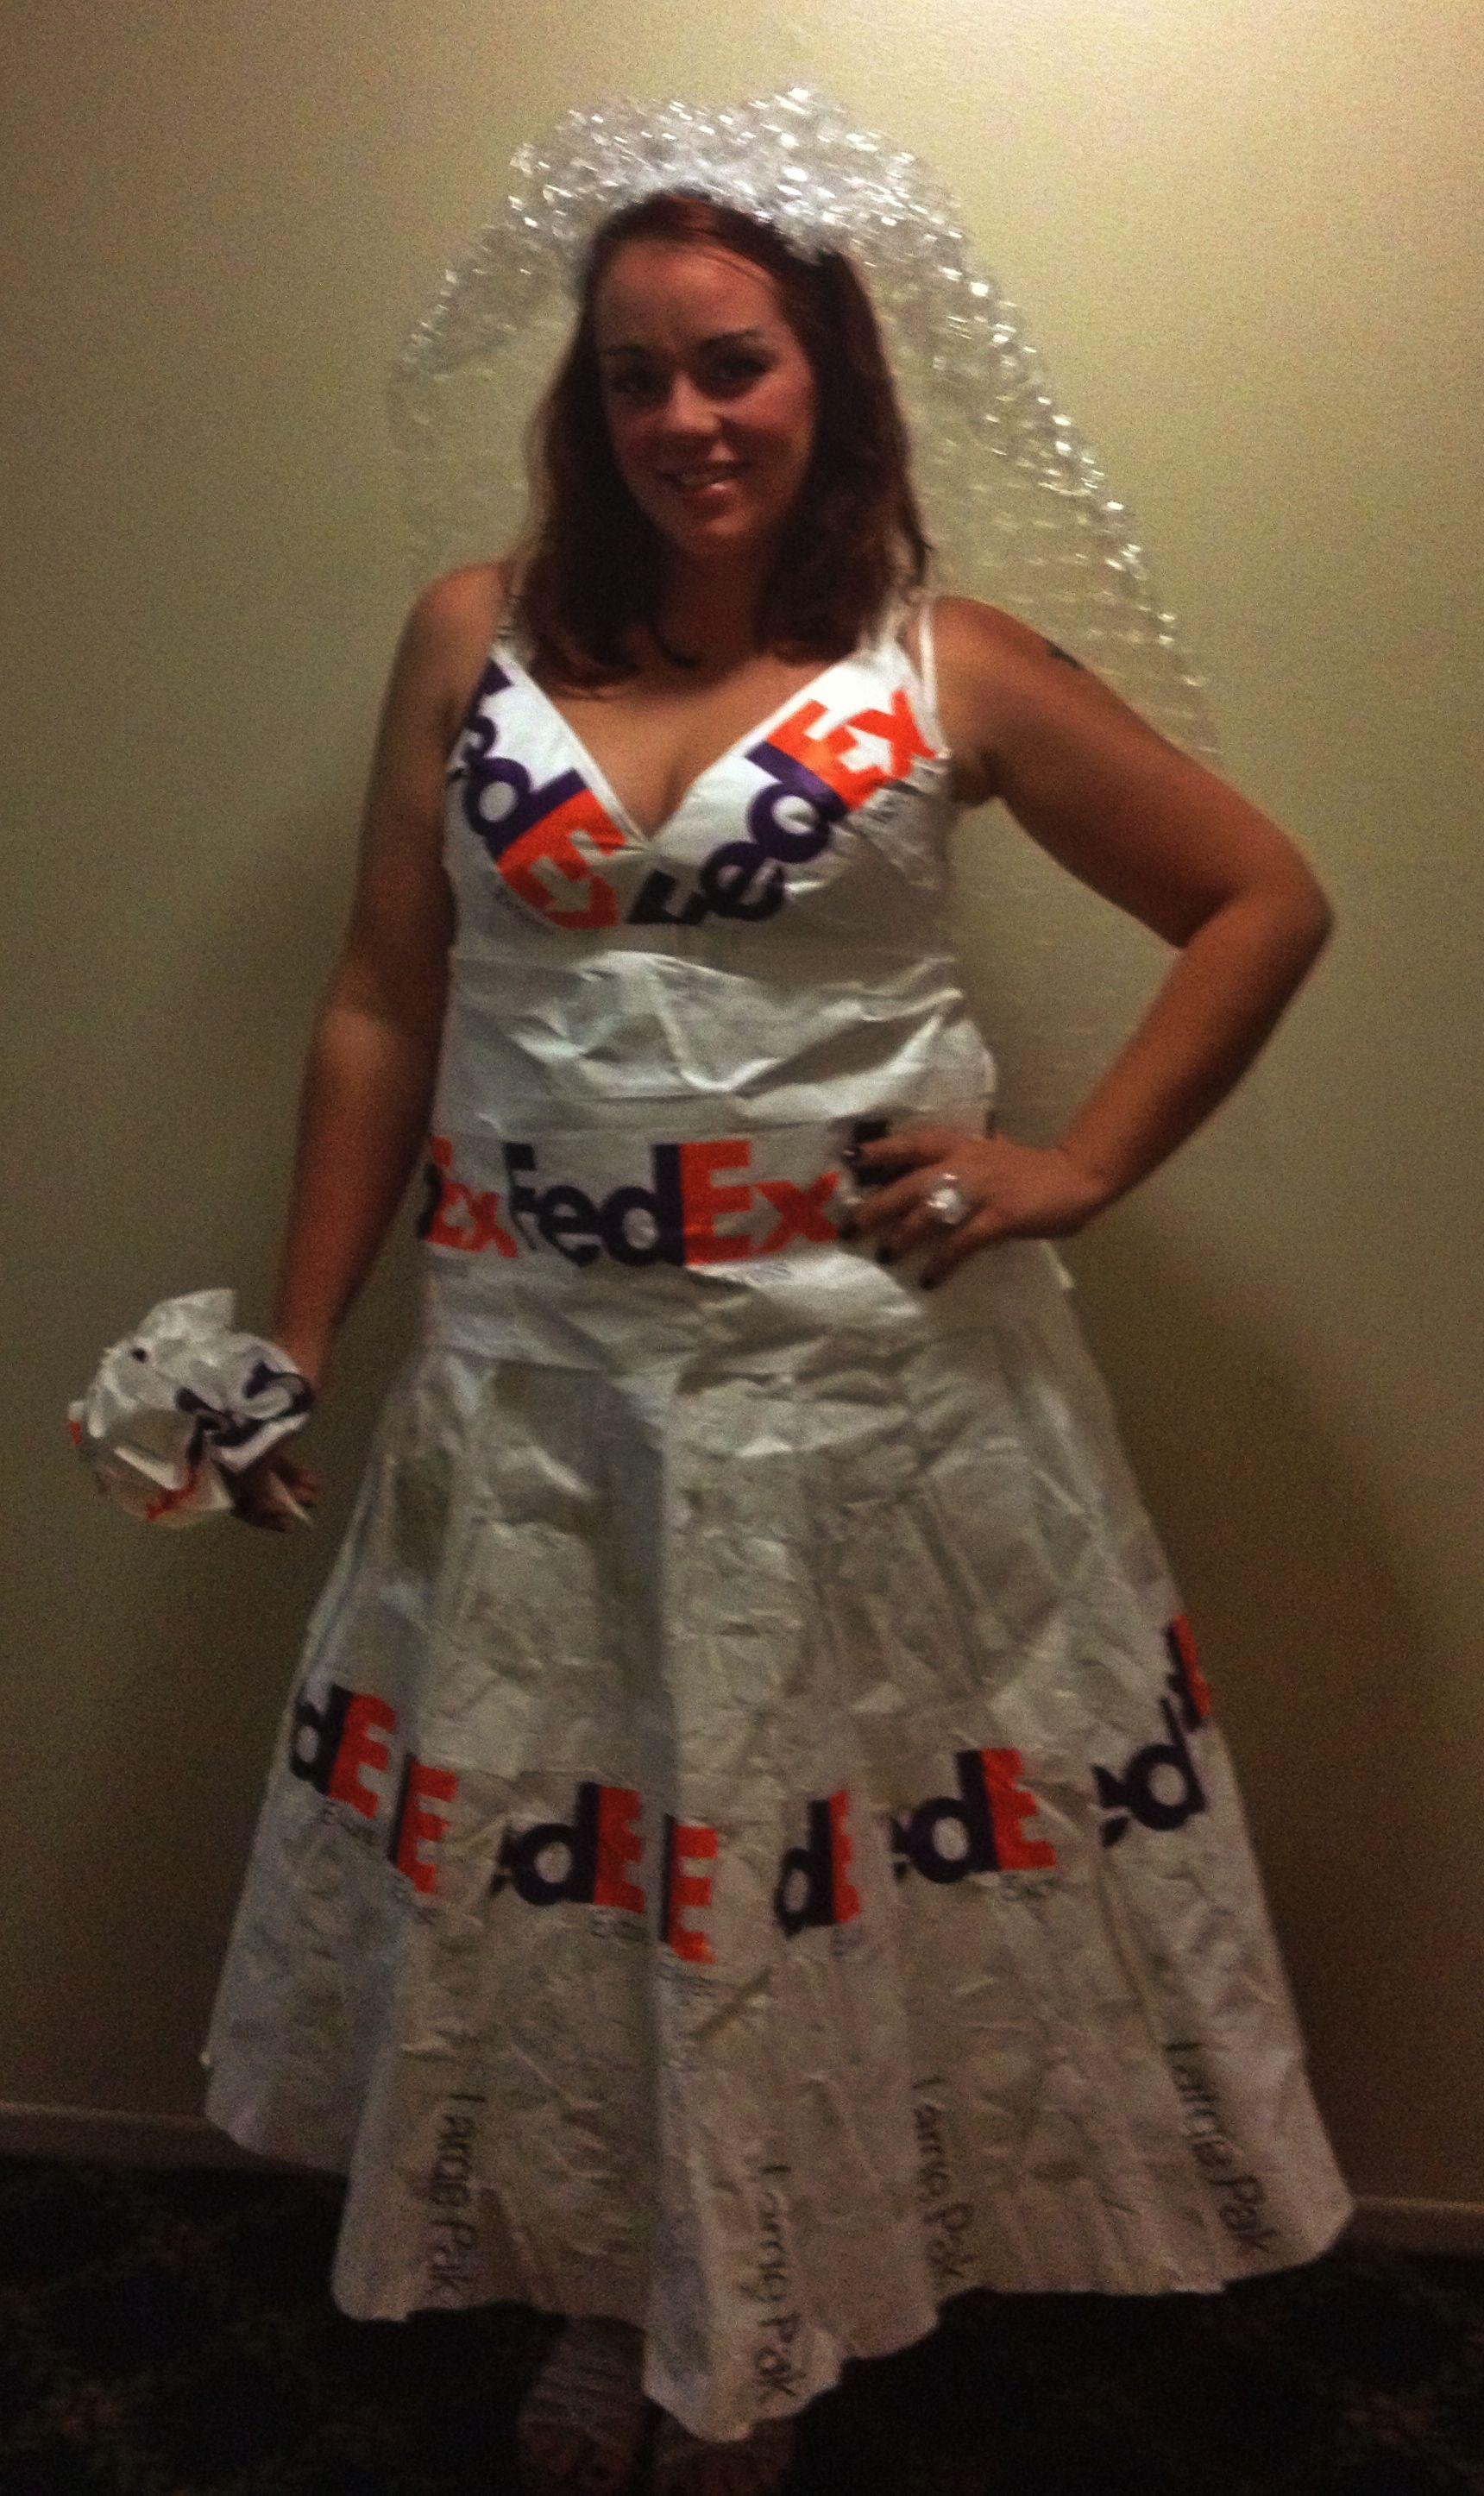 Mail Order Bride By Lisa 52